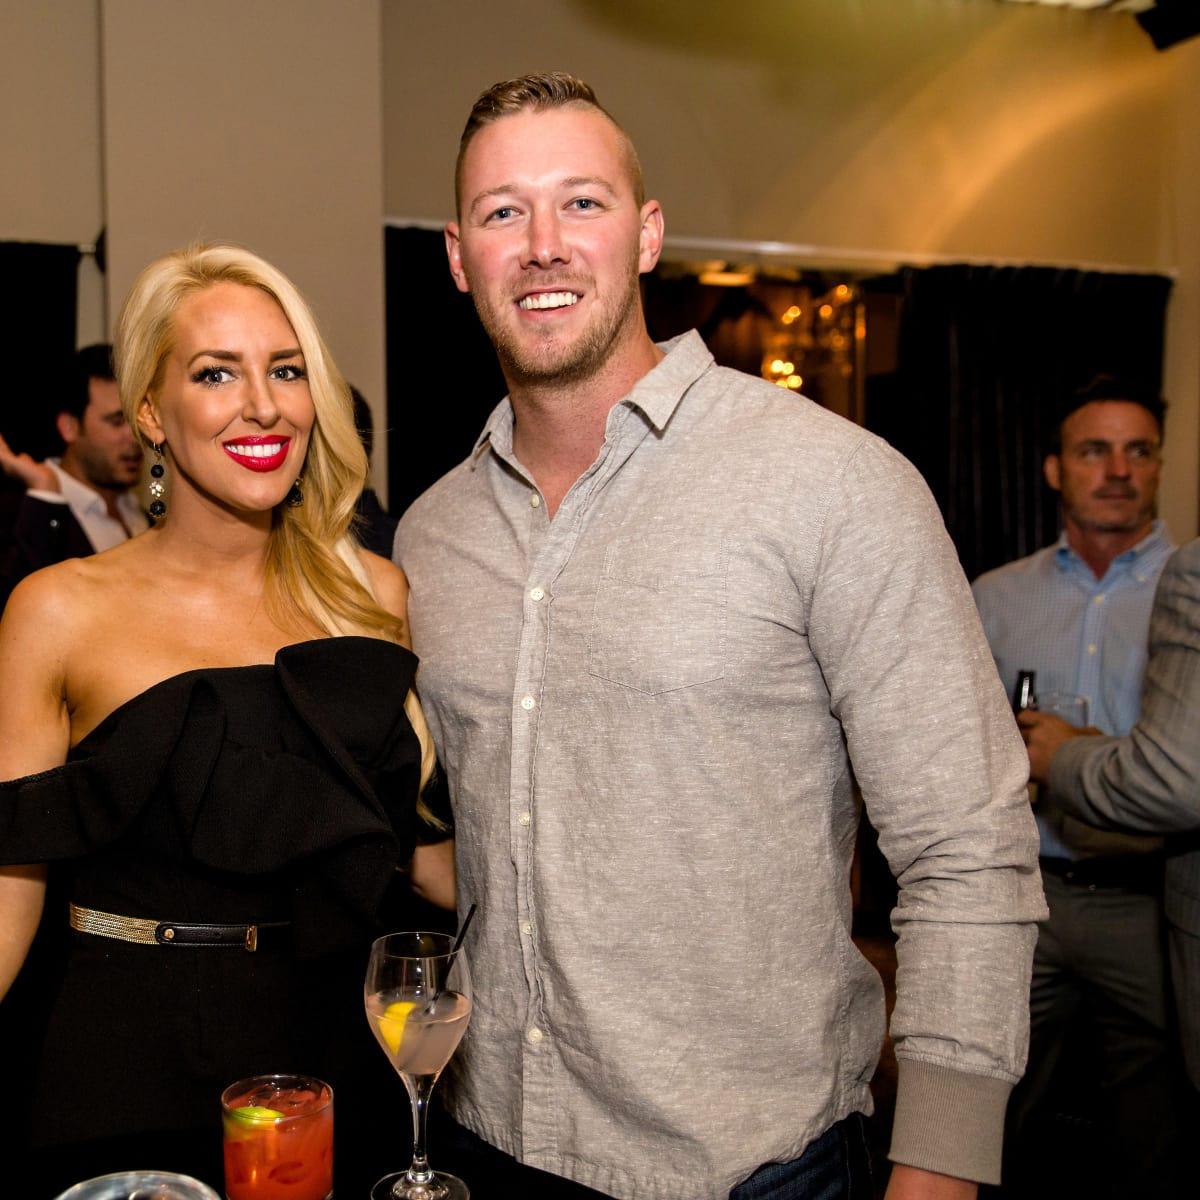 Houston, SportsMap launch party, October 2017, Robin Carlin, Kyle Martens